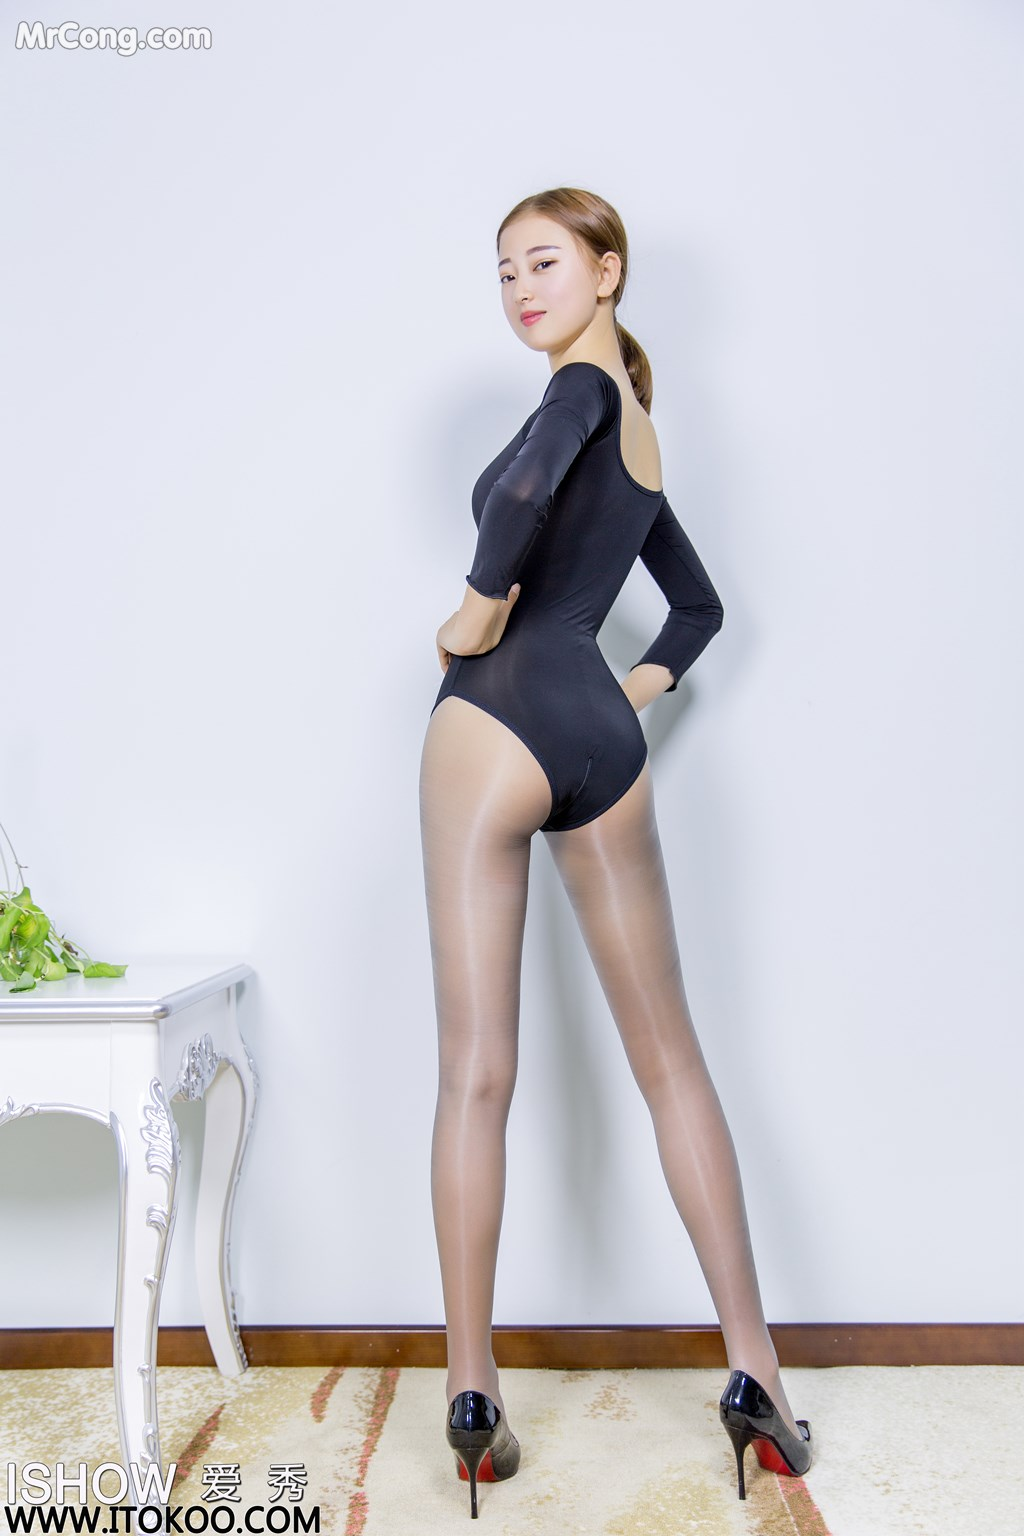 Image ISHOW-No.151-Han-Zhi-Ying-Flora-MrCong.com-007 in post ISHOW No.151: Người mẫu Han Zhi Ying (寒栀樱Flora) (31 ảnh)